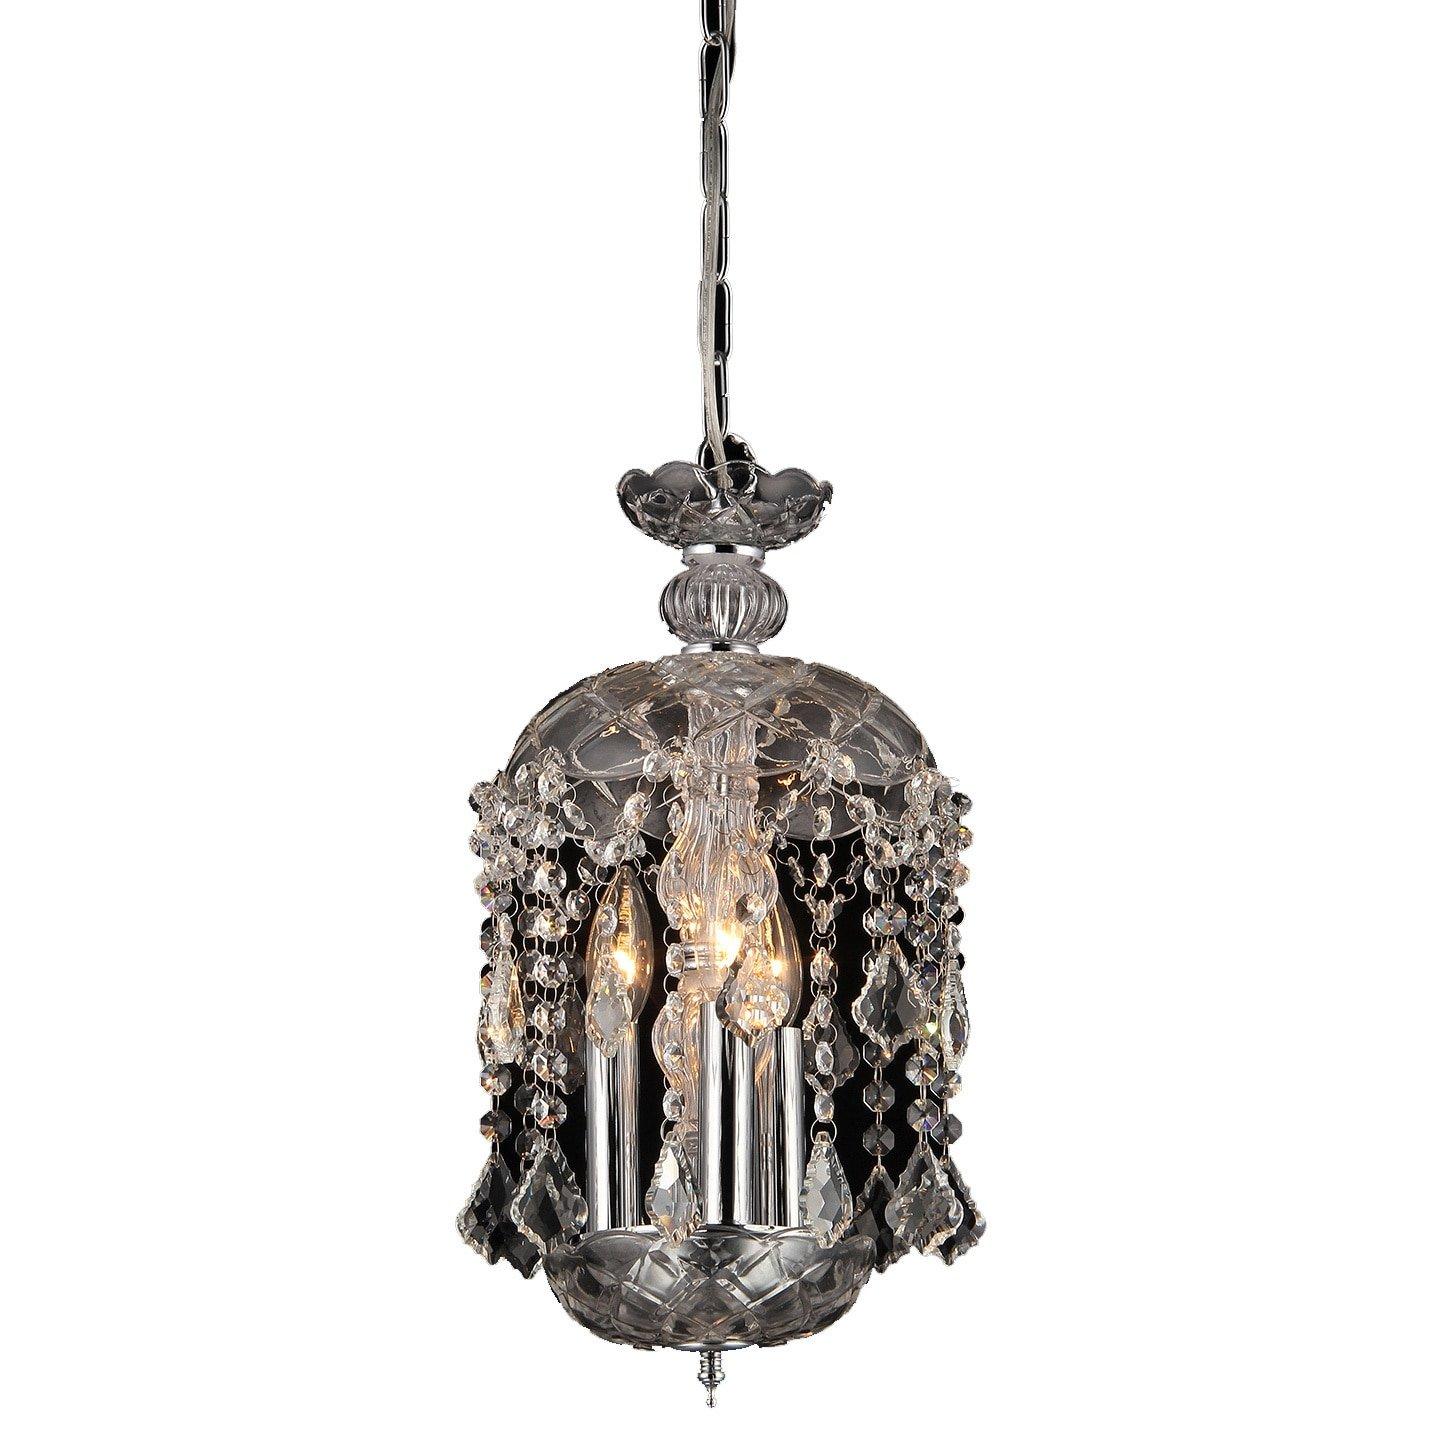 Warehouse of Tiffany RL8038C Karla 3-Light Clear Glass Crystal Chandelier, 11'' x 11'' x 20''